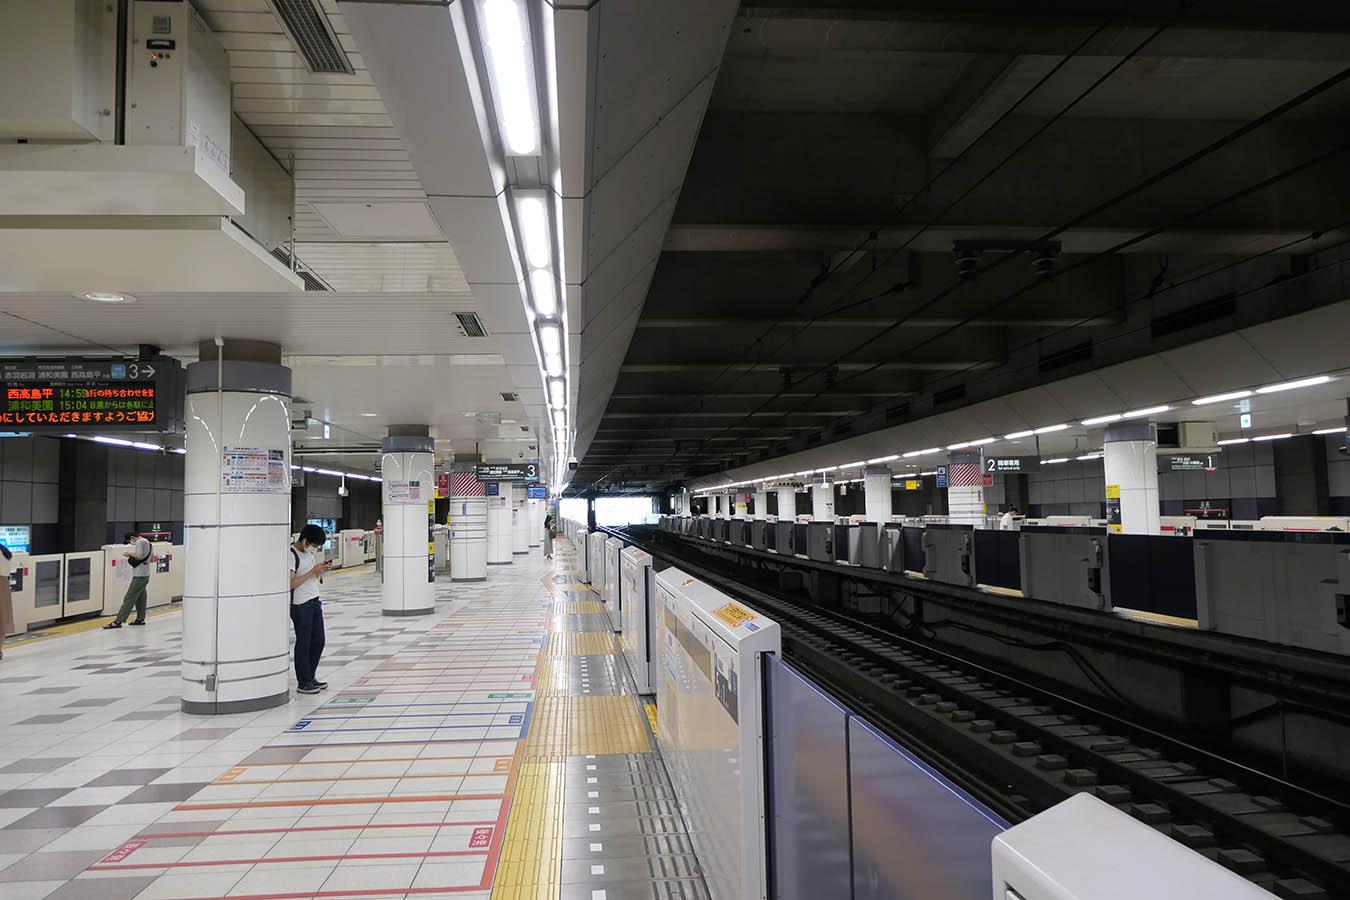 MG13_photo04.jpg